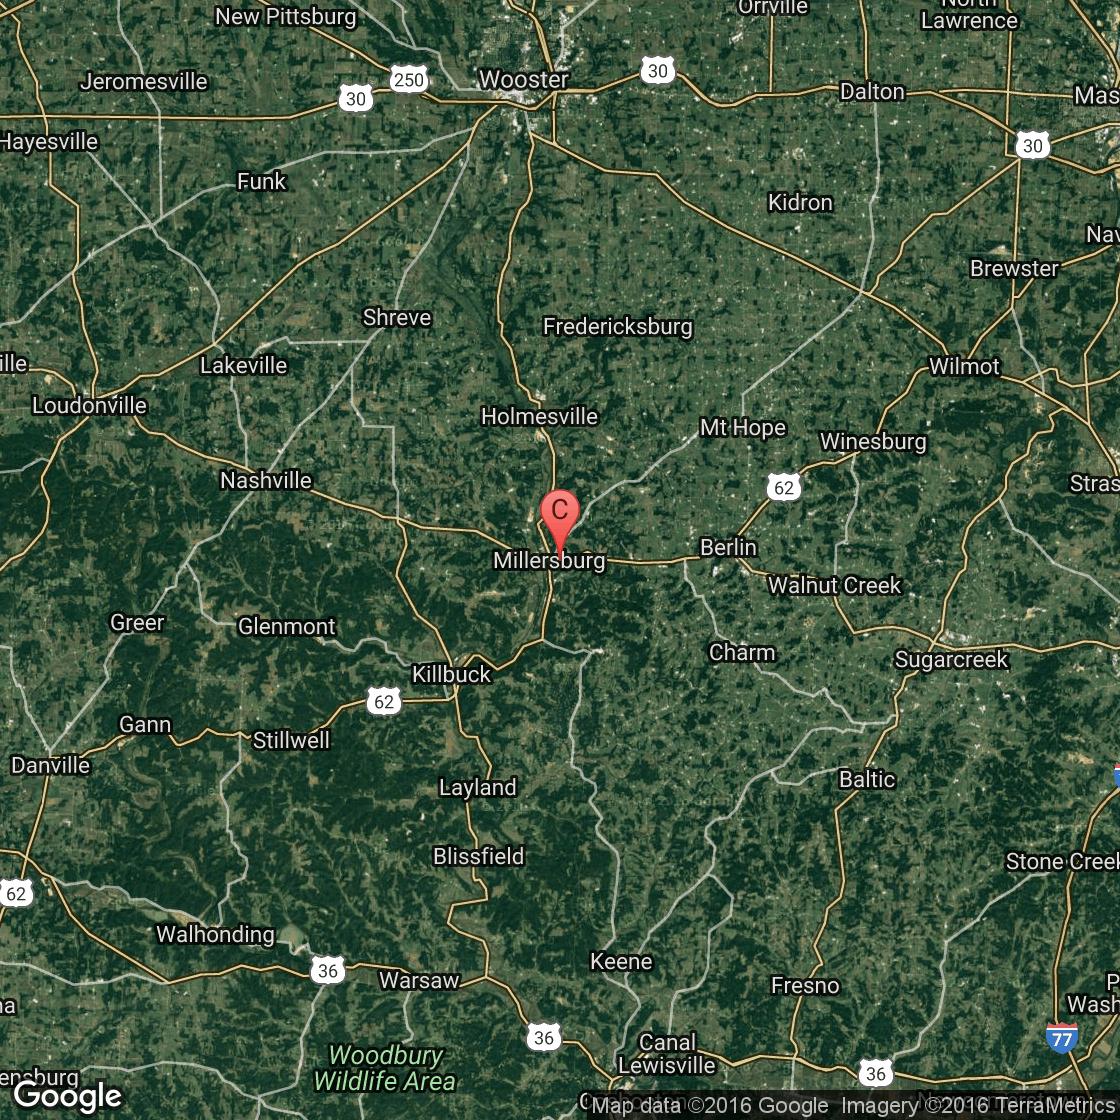 Ohio holmes county nashville - Ohio Holmes County Nashville 51